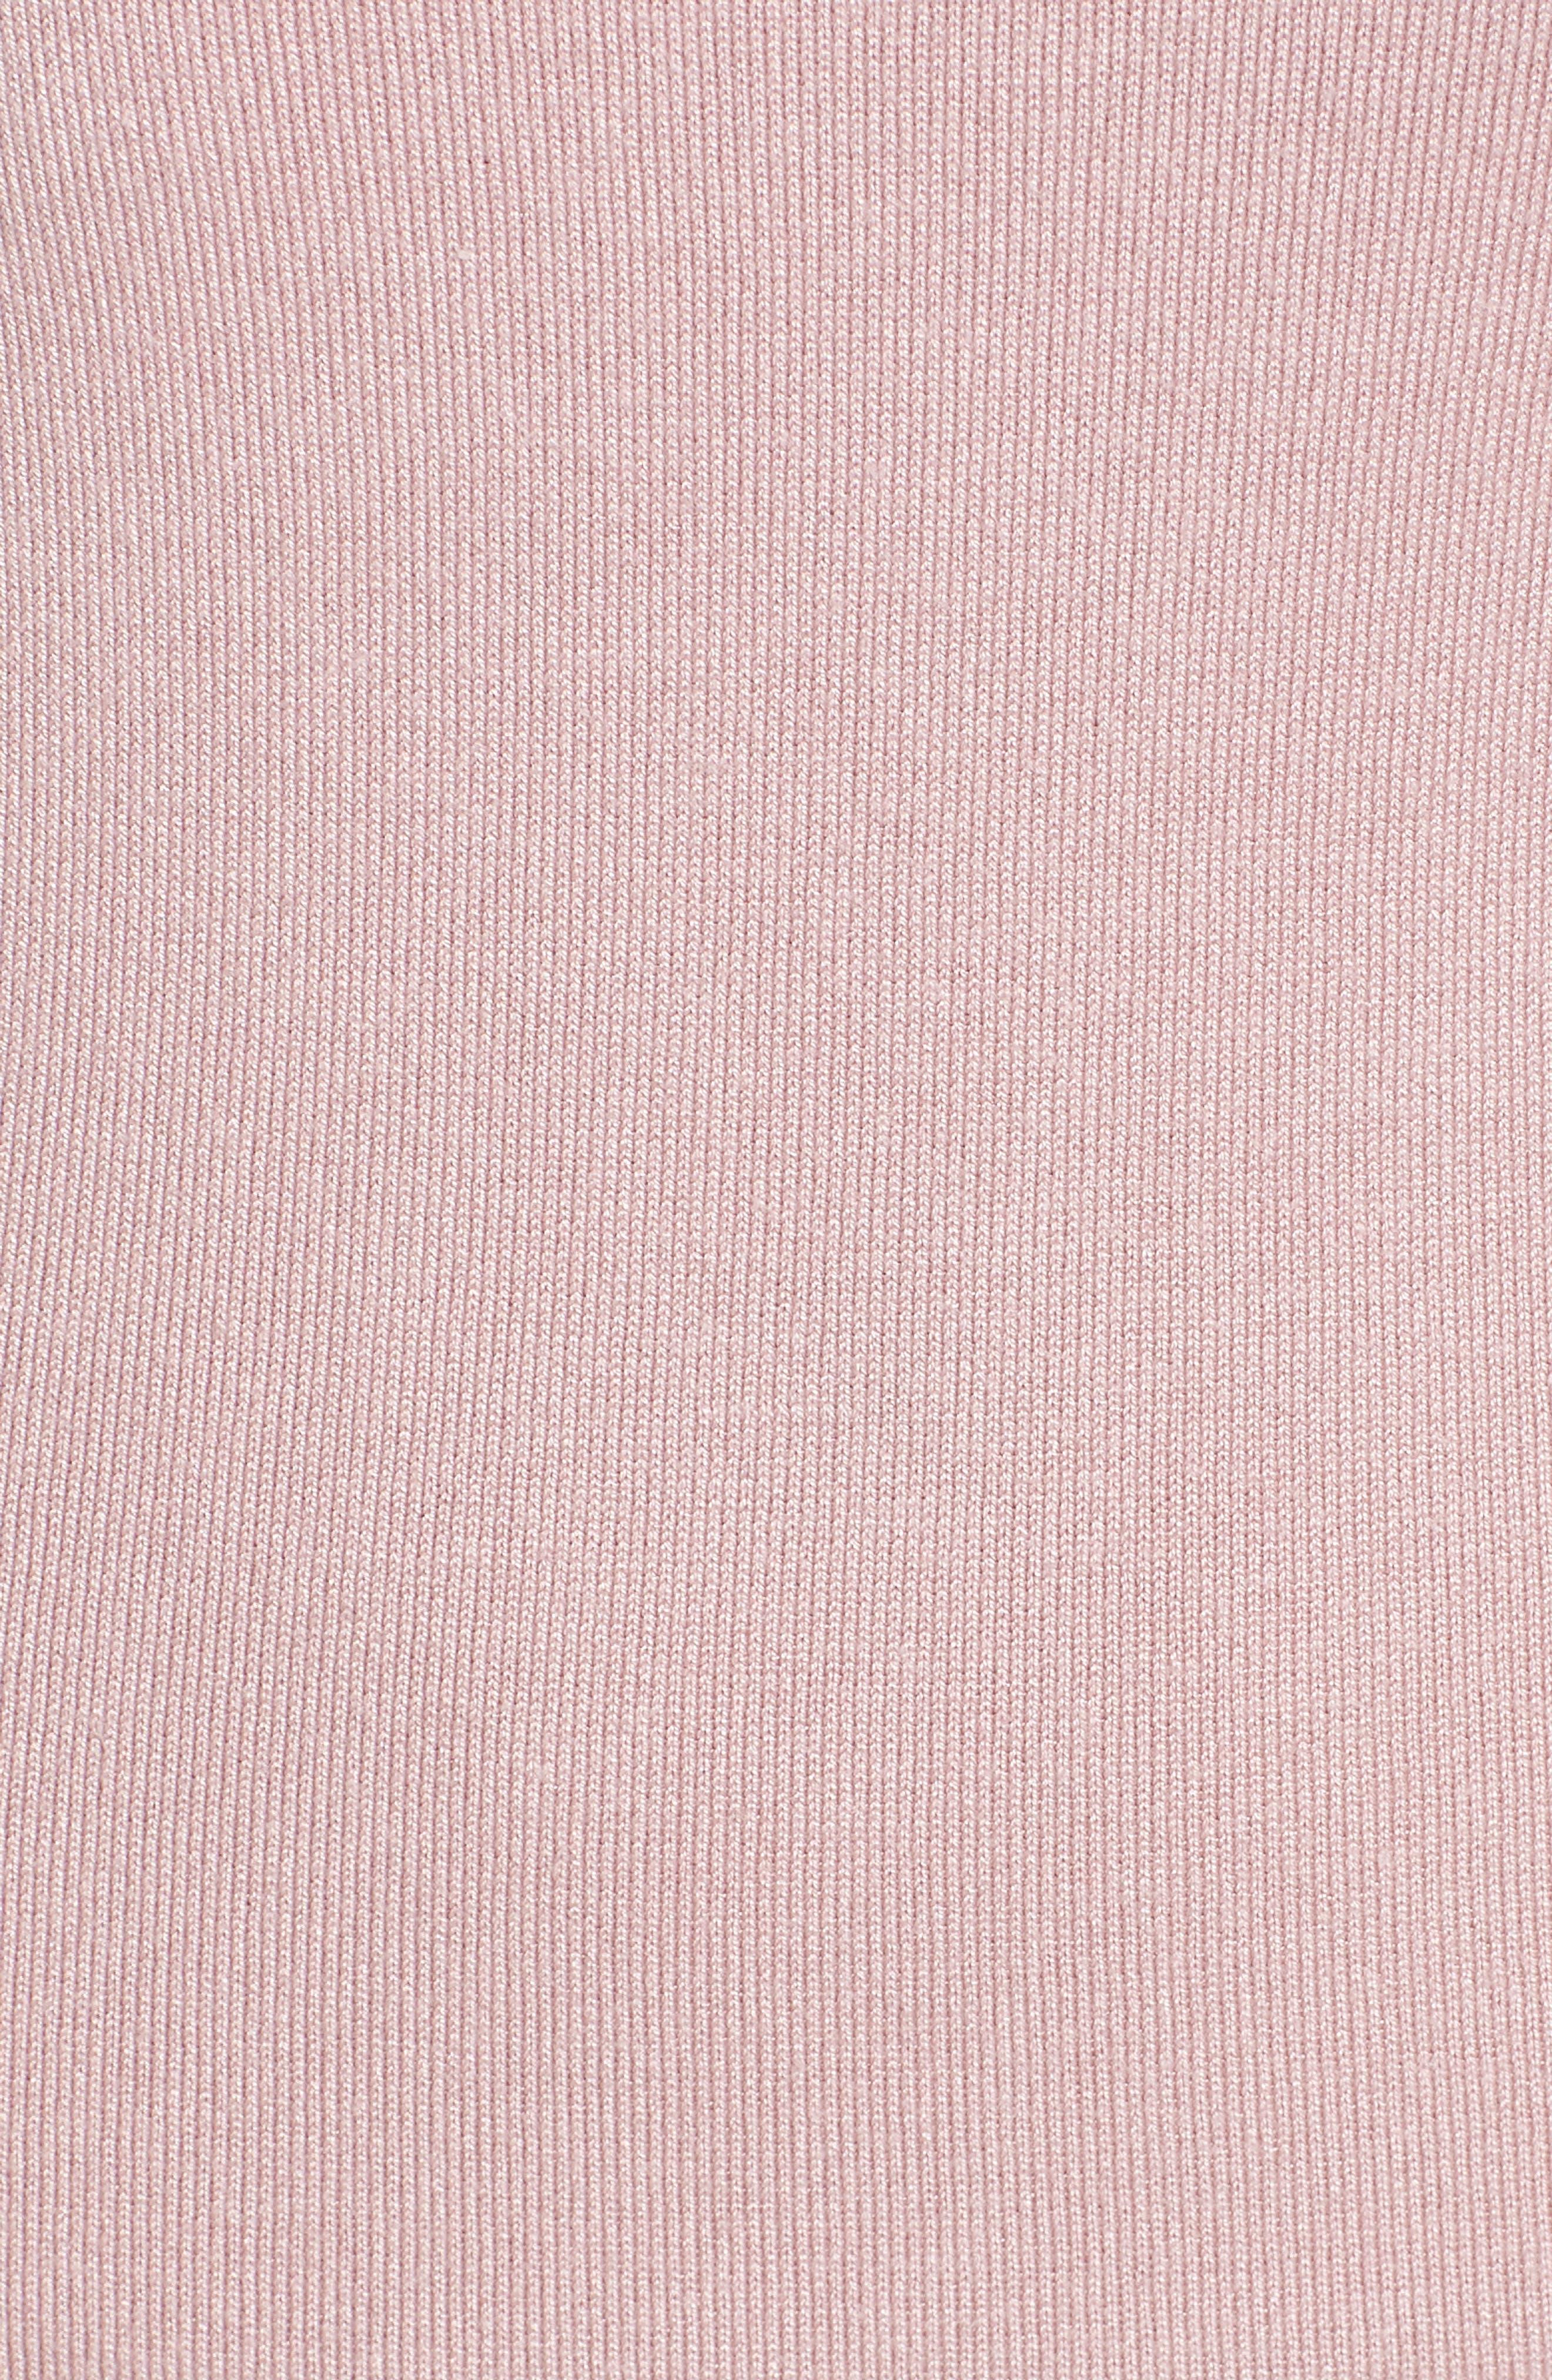 Body-Con Midi Dress,                             Alternate thumbnail 5, color,                             Light Pink